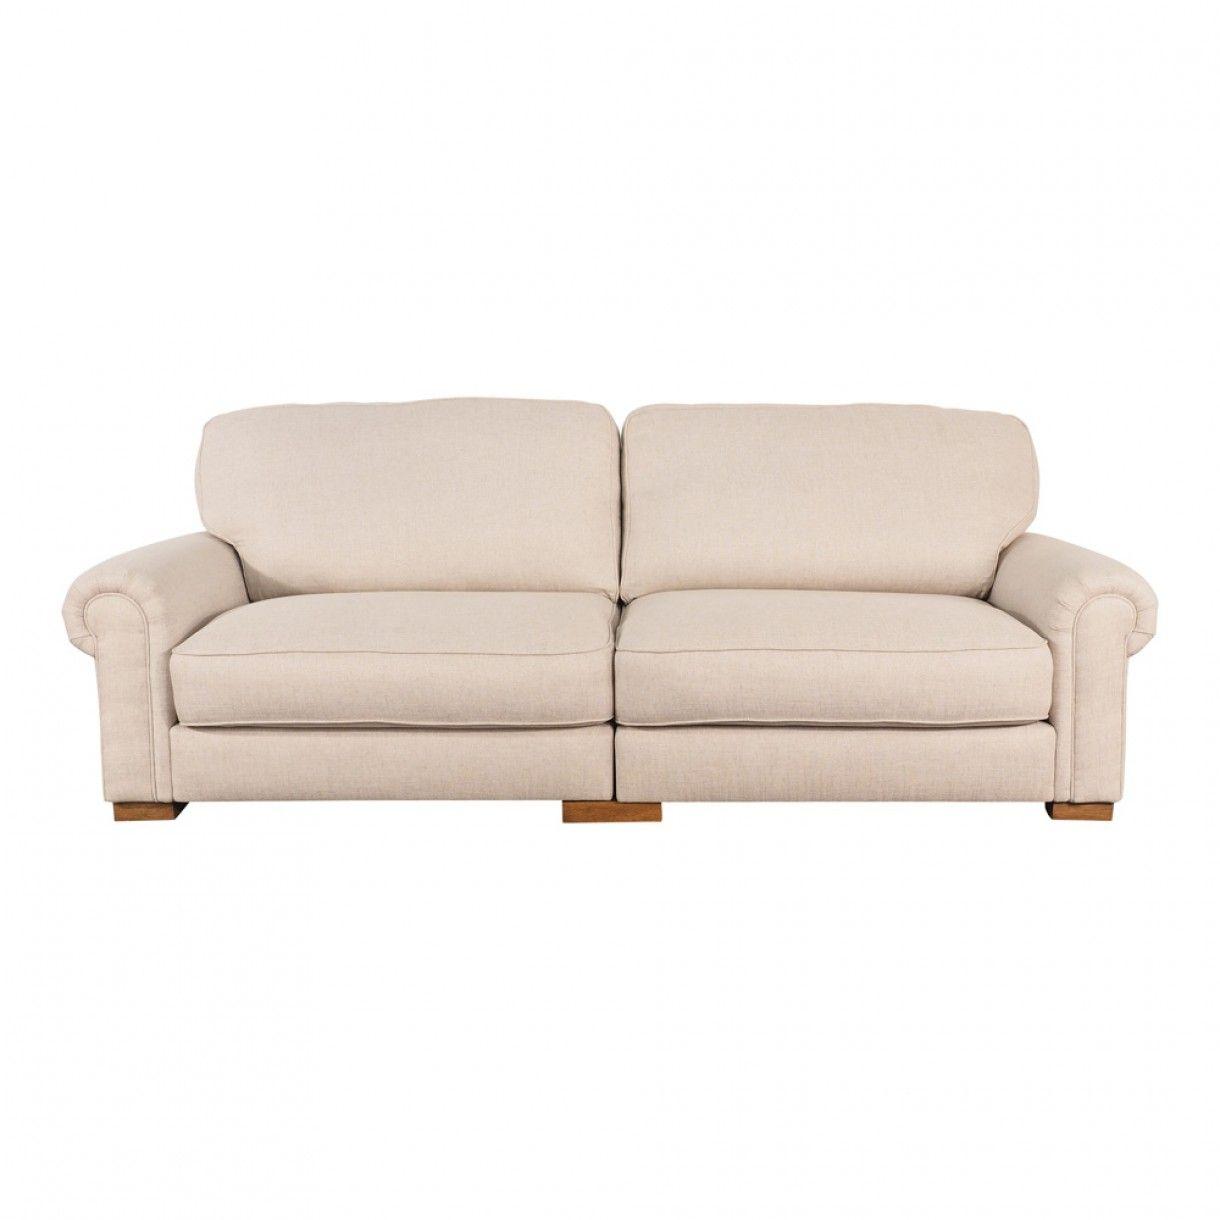 Edward 4 Seater Sofa Dublin Linen